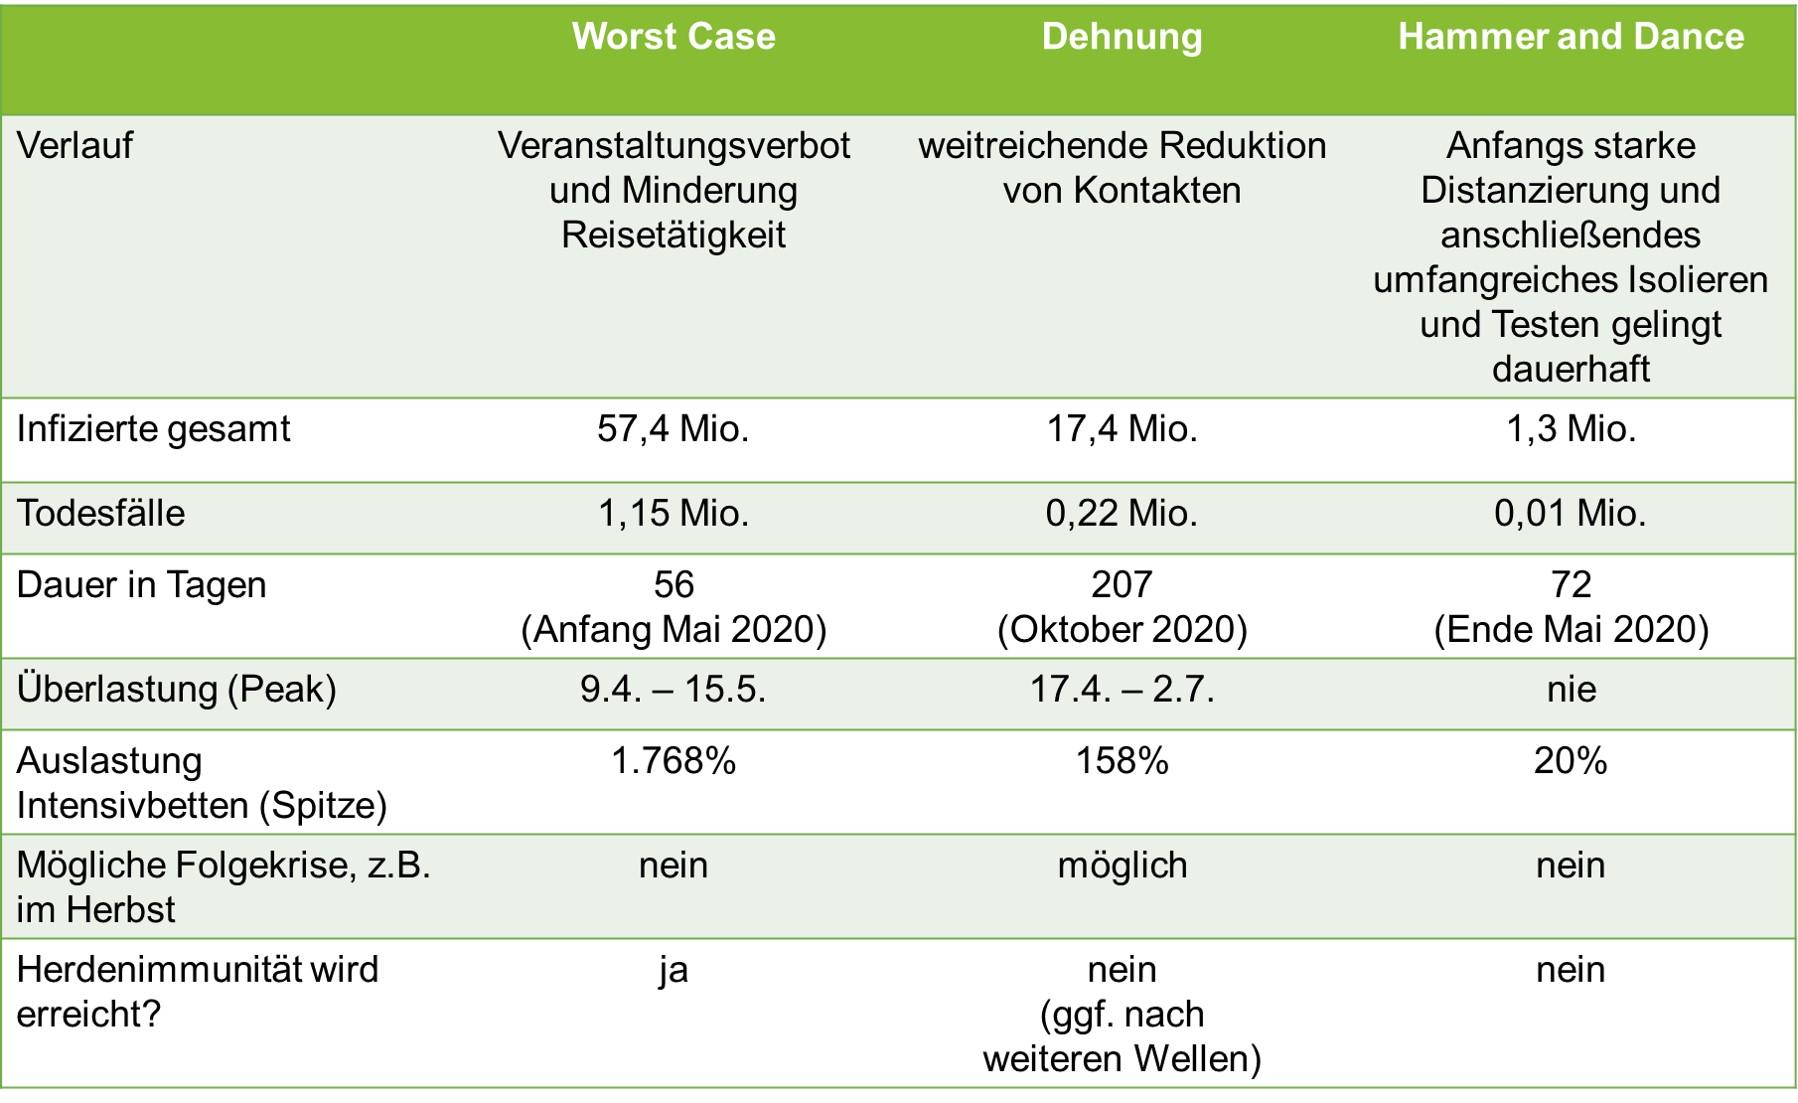 Coronavirus-Szenarien aus dem Strategiepapier